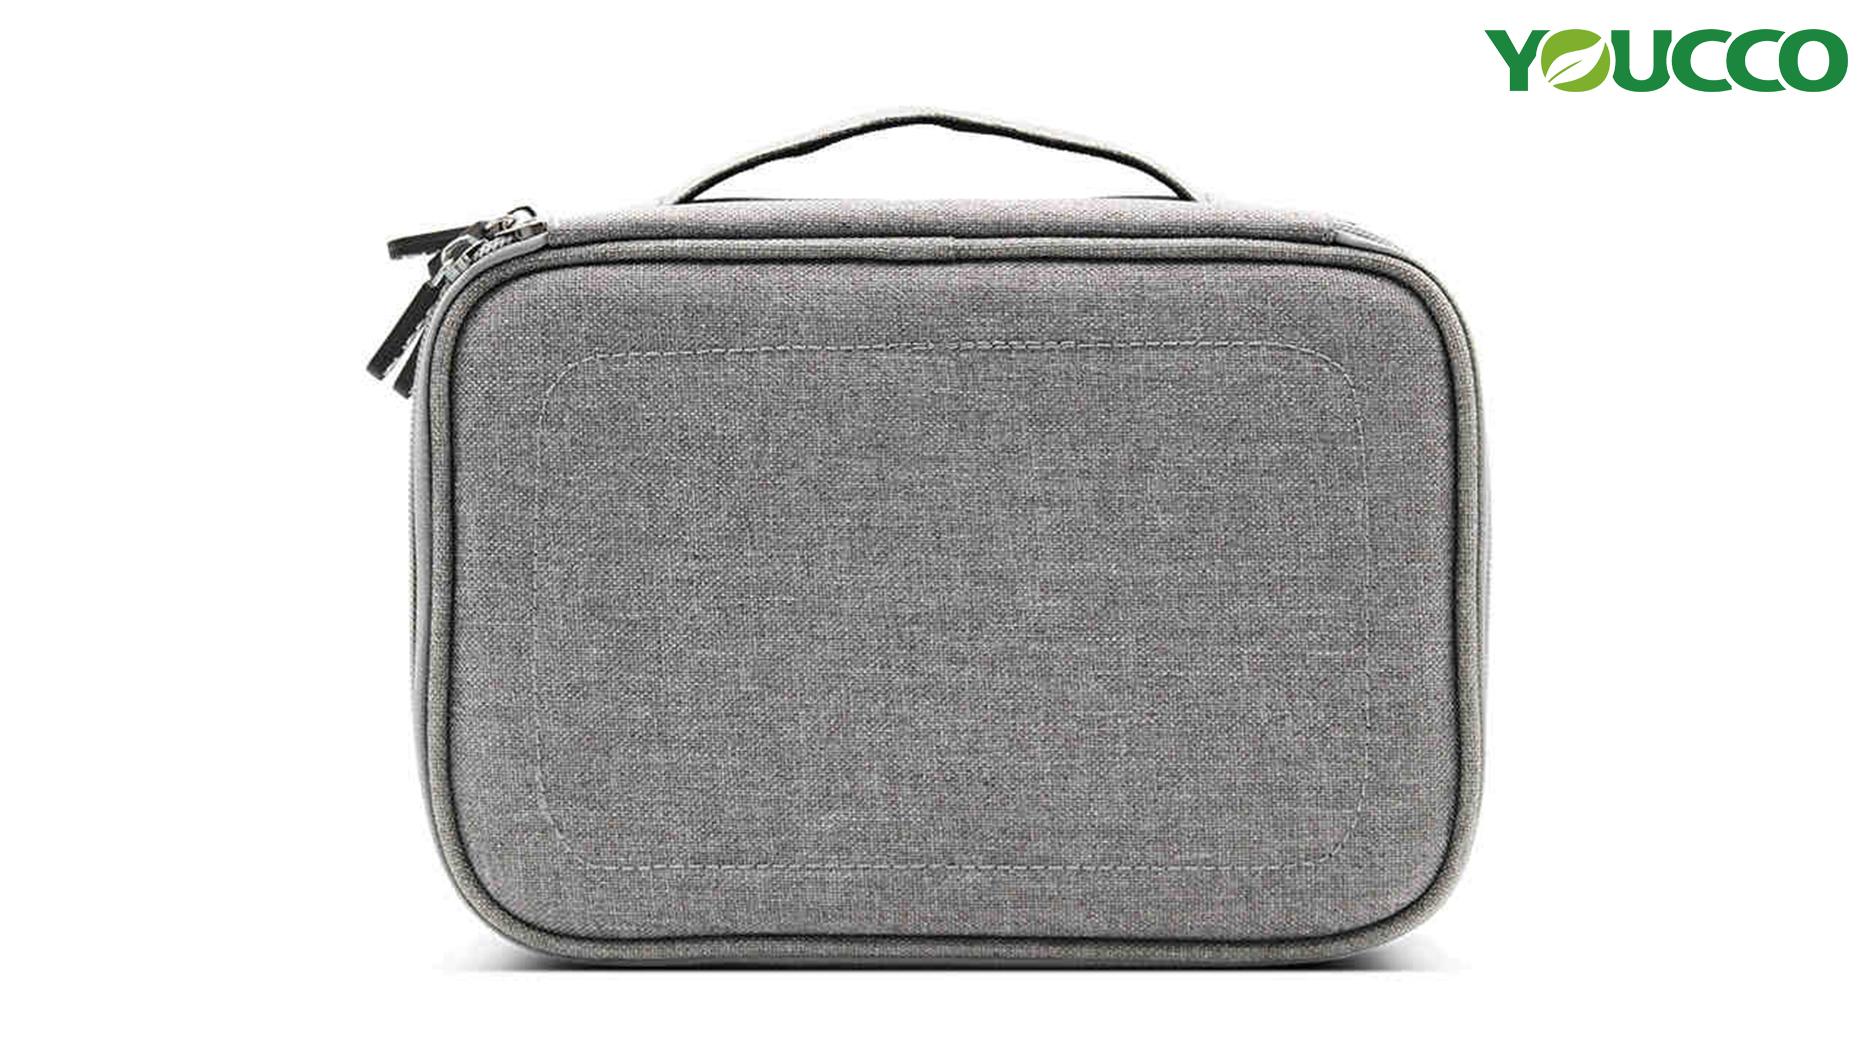 Travel USB Cable Organizer Bag PM80713